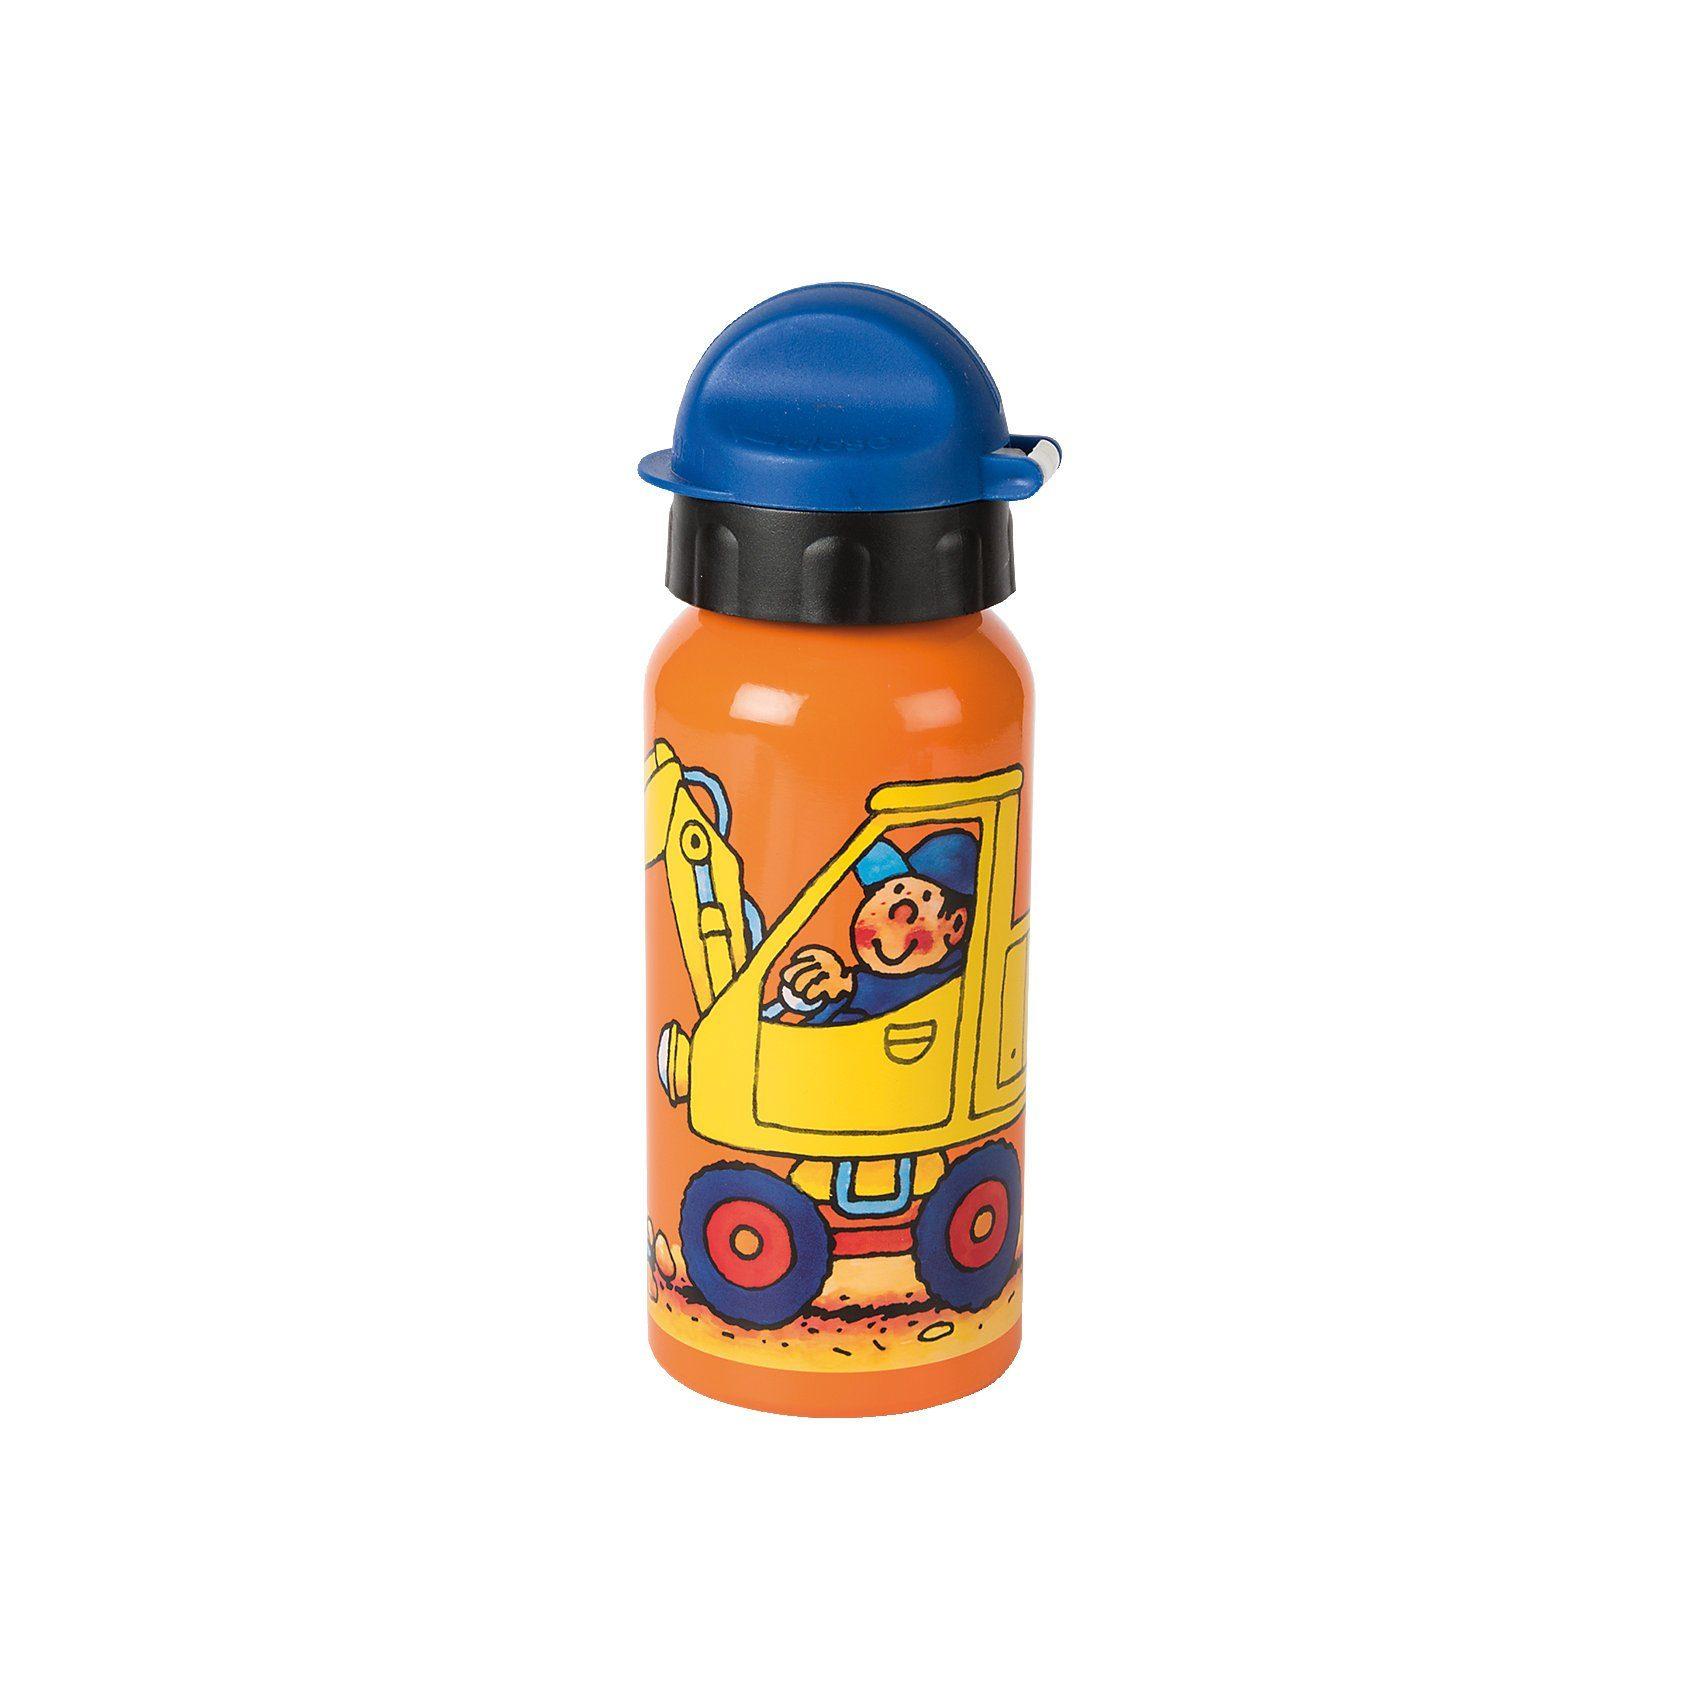 Lutz Mauder Verlag Trinkflasche Bagger, 400 ml